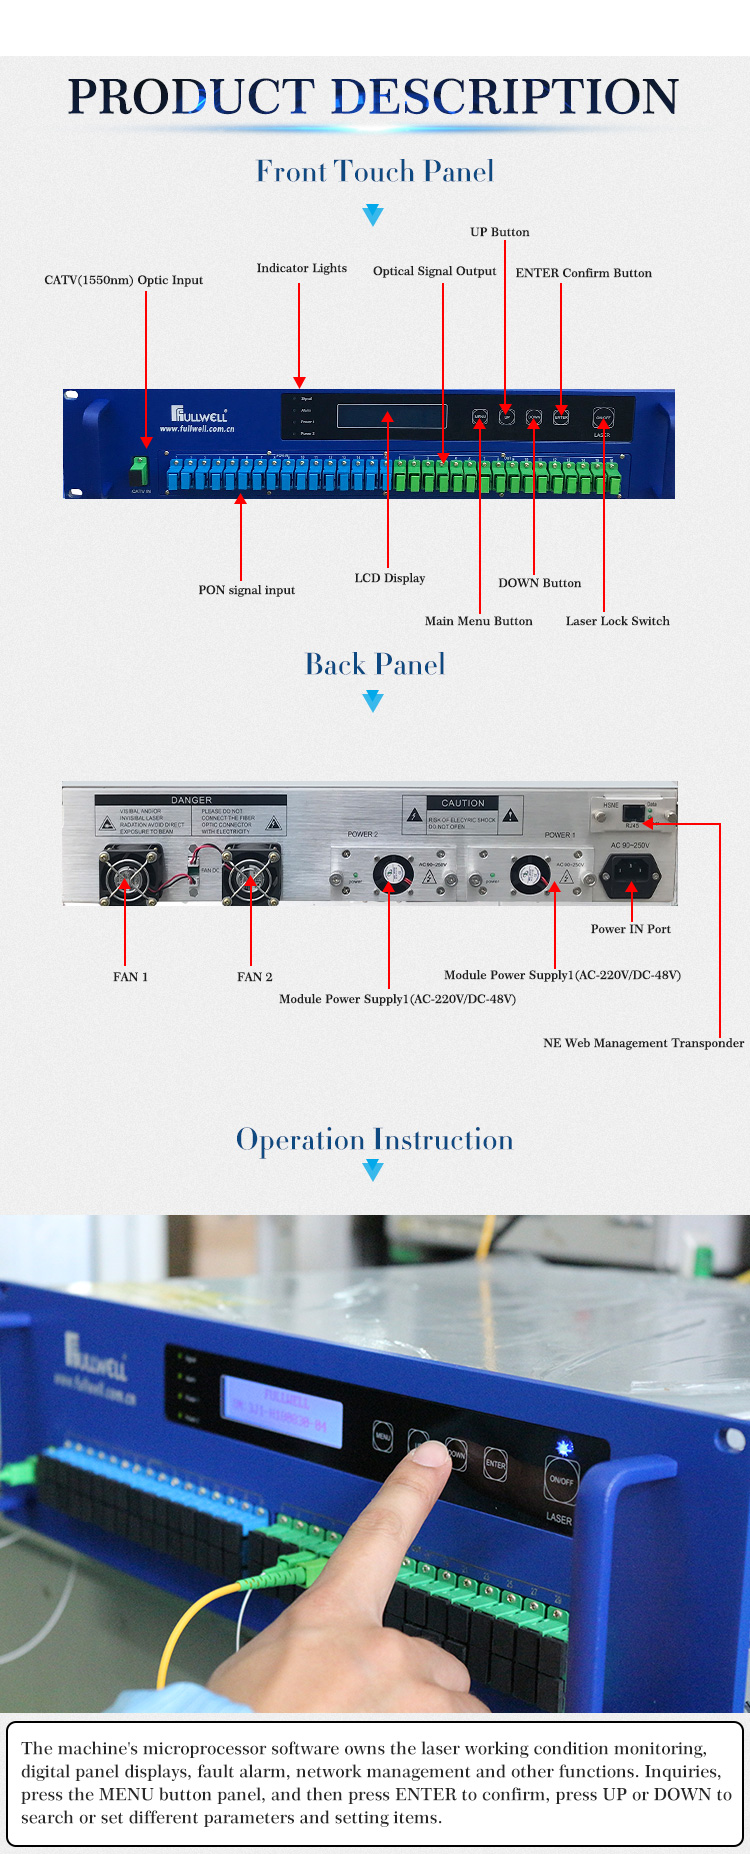 Fullwell Yüksek Güç 1550 2U 16 Port 19dBm Fiber Optik CATV Amplifikatör EDFA WDM